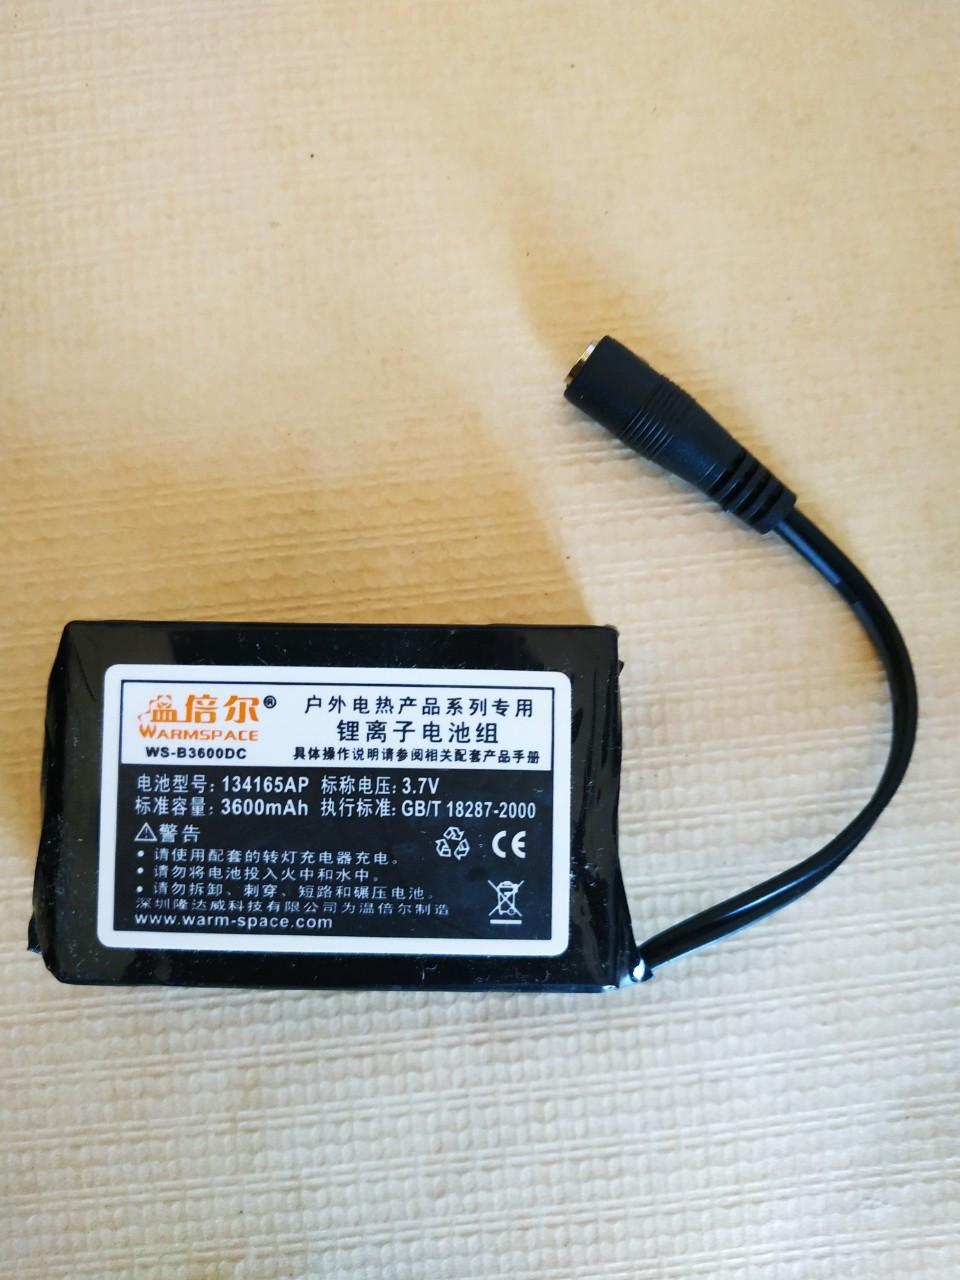 Аккумулятор Li-polimer. 3.7v  3600mAh Для перчаток, носков, стелек с подогревом. (DC мама)